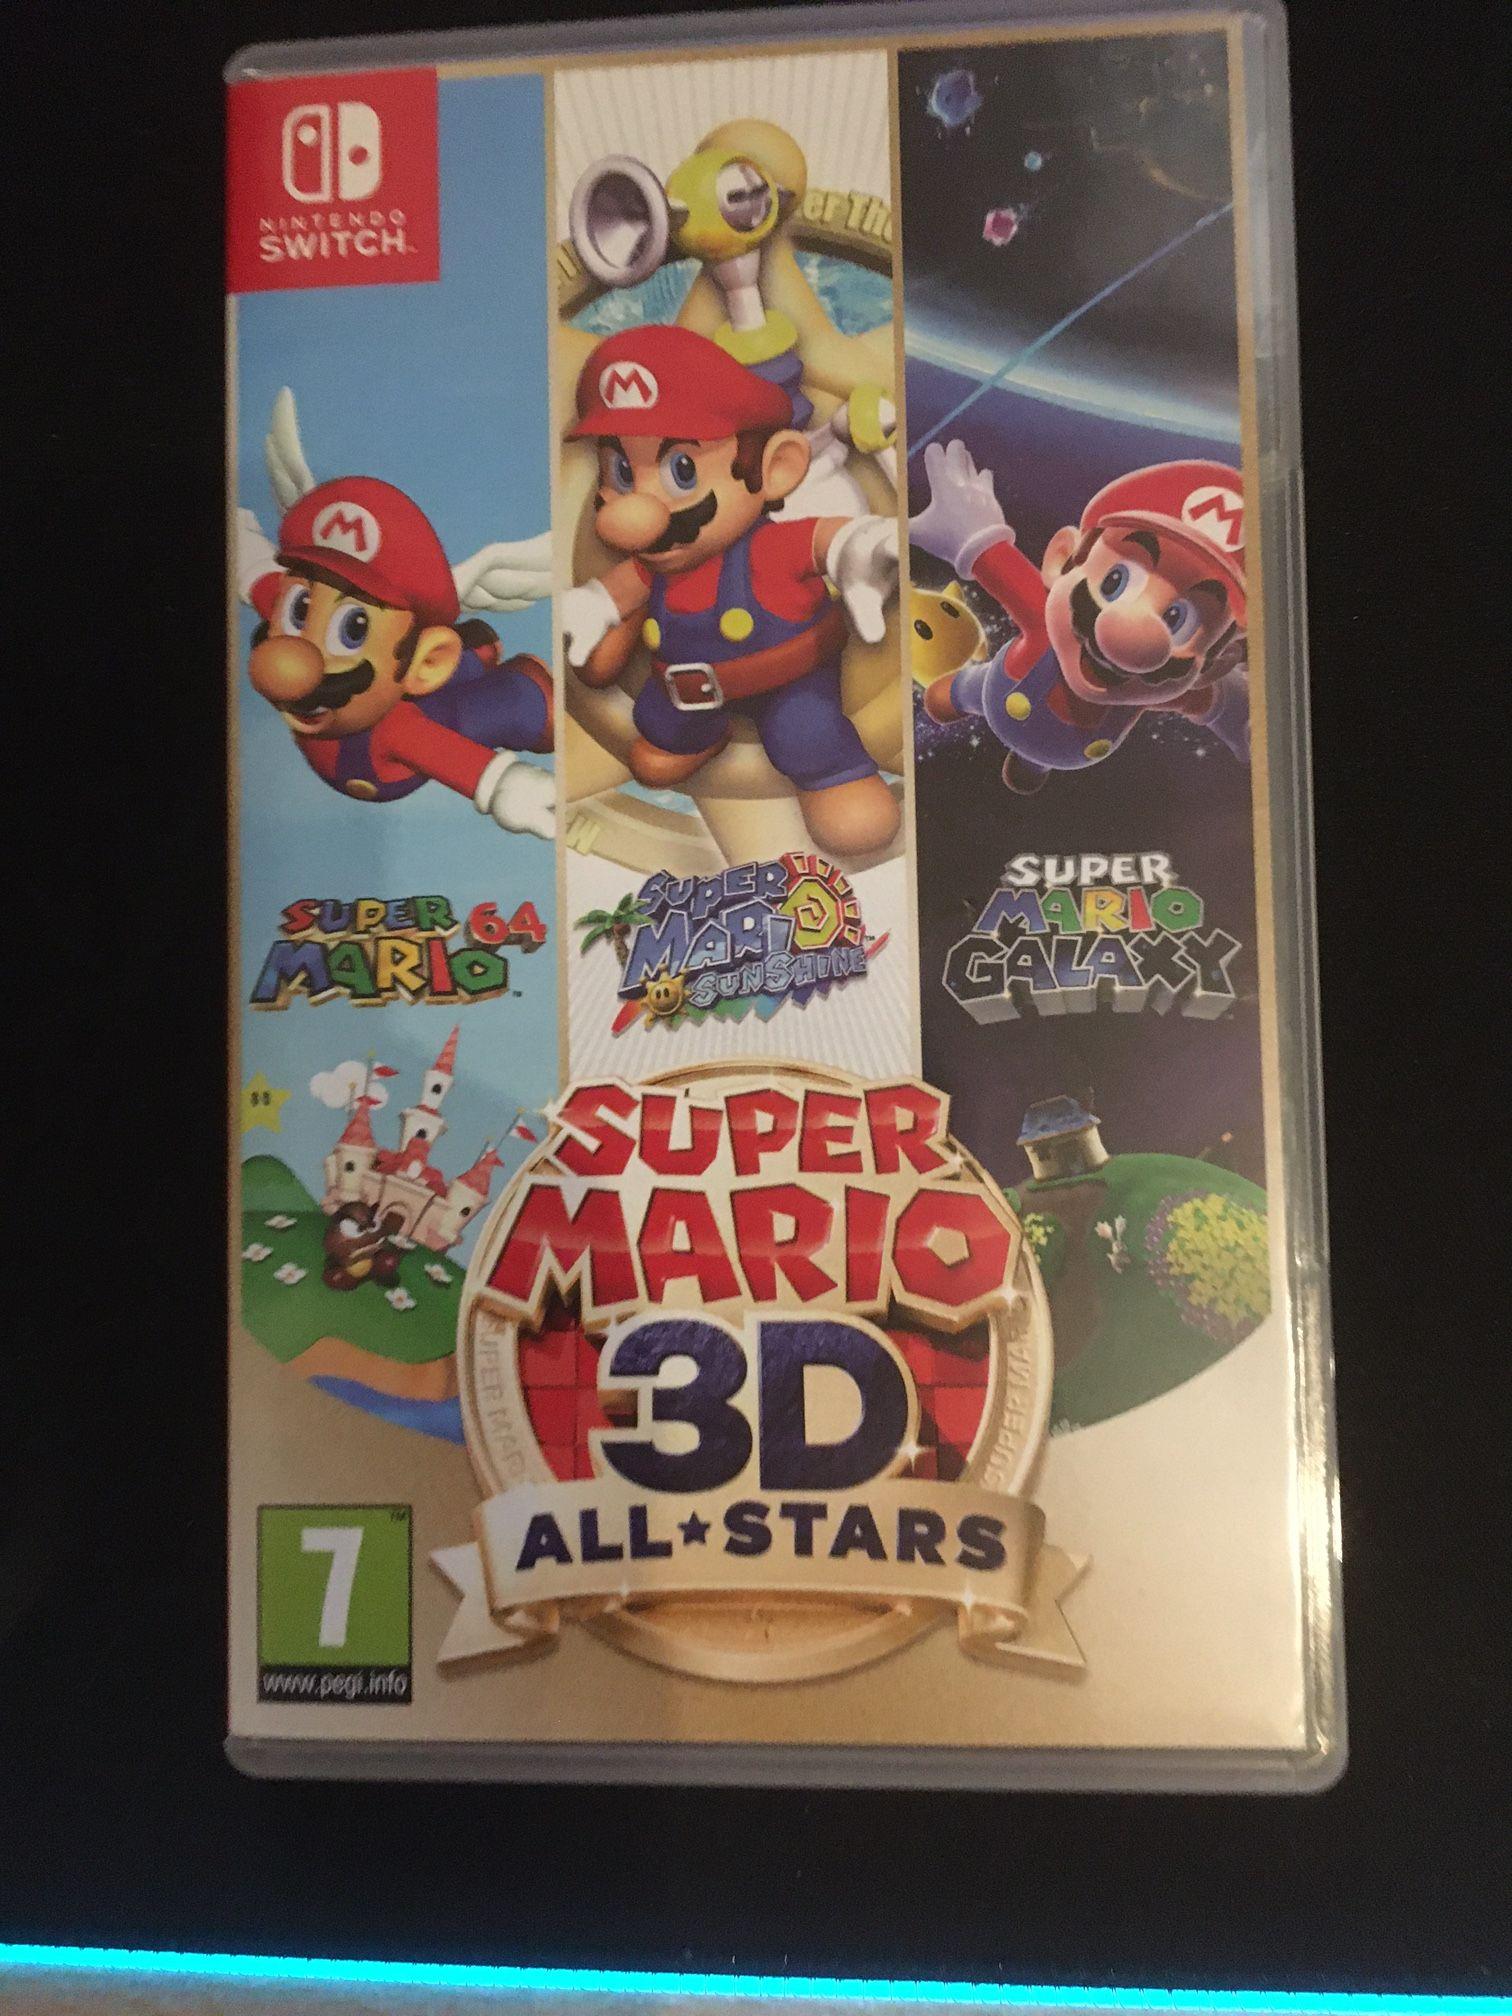 Super Mario 3d All Stars Bevat Super Mario 64 Super Mario Sunshine En Super Mario Galaxy Allemaal Geoptimaliseerd Voor Nintendo Switch Limitededition Super In 2020